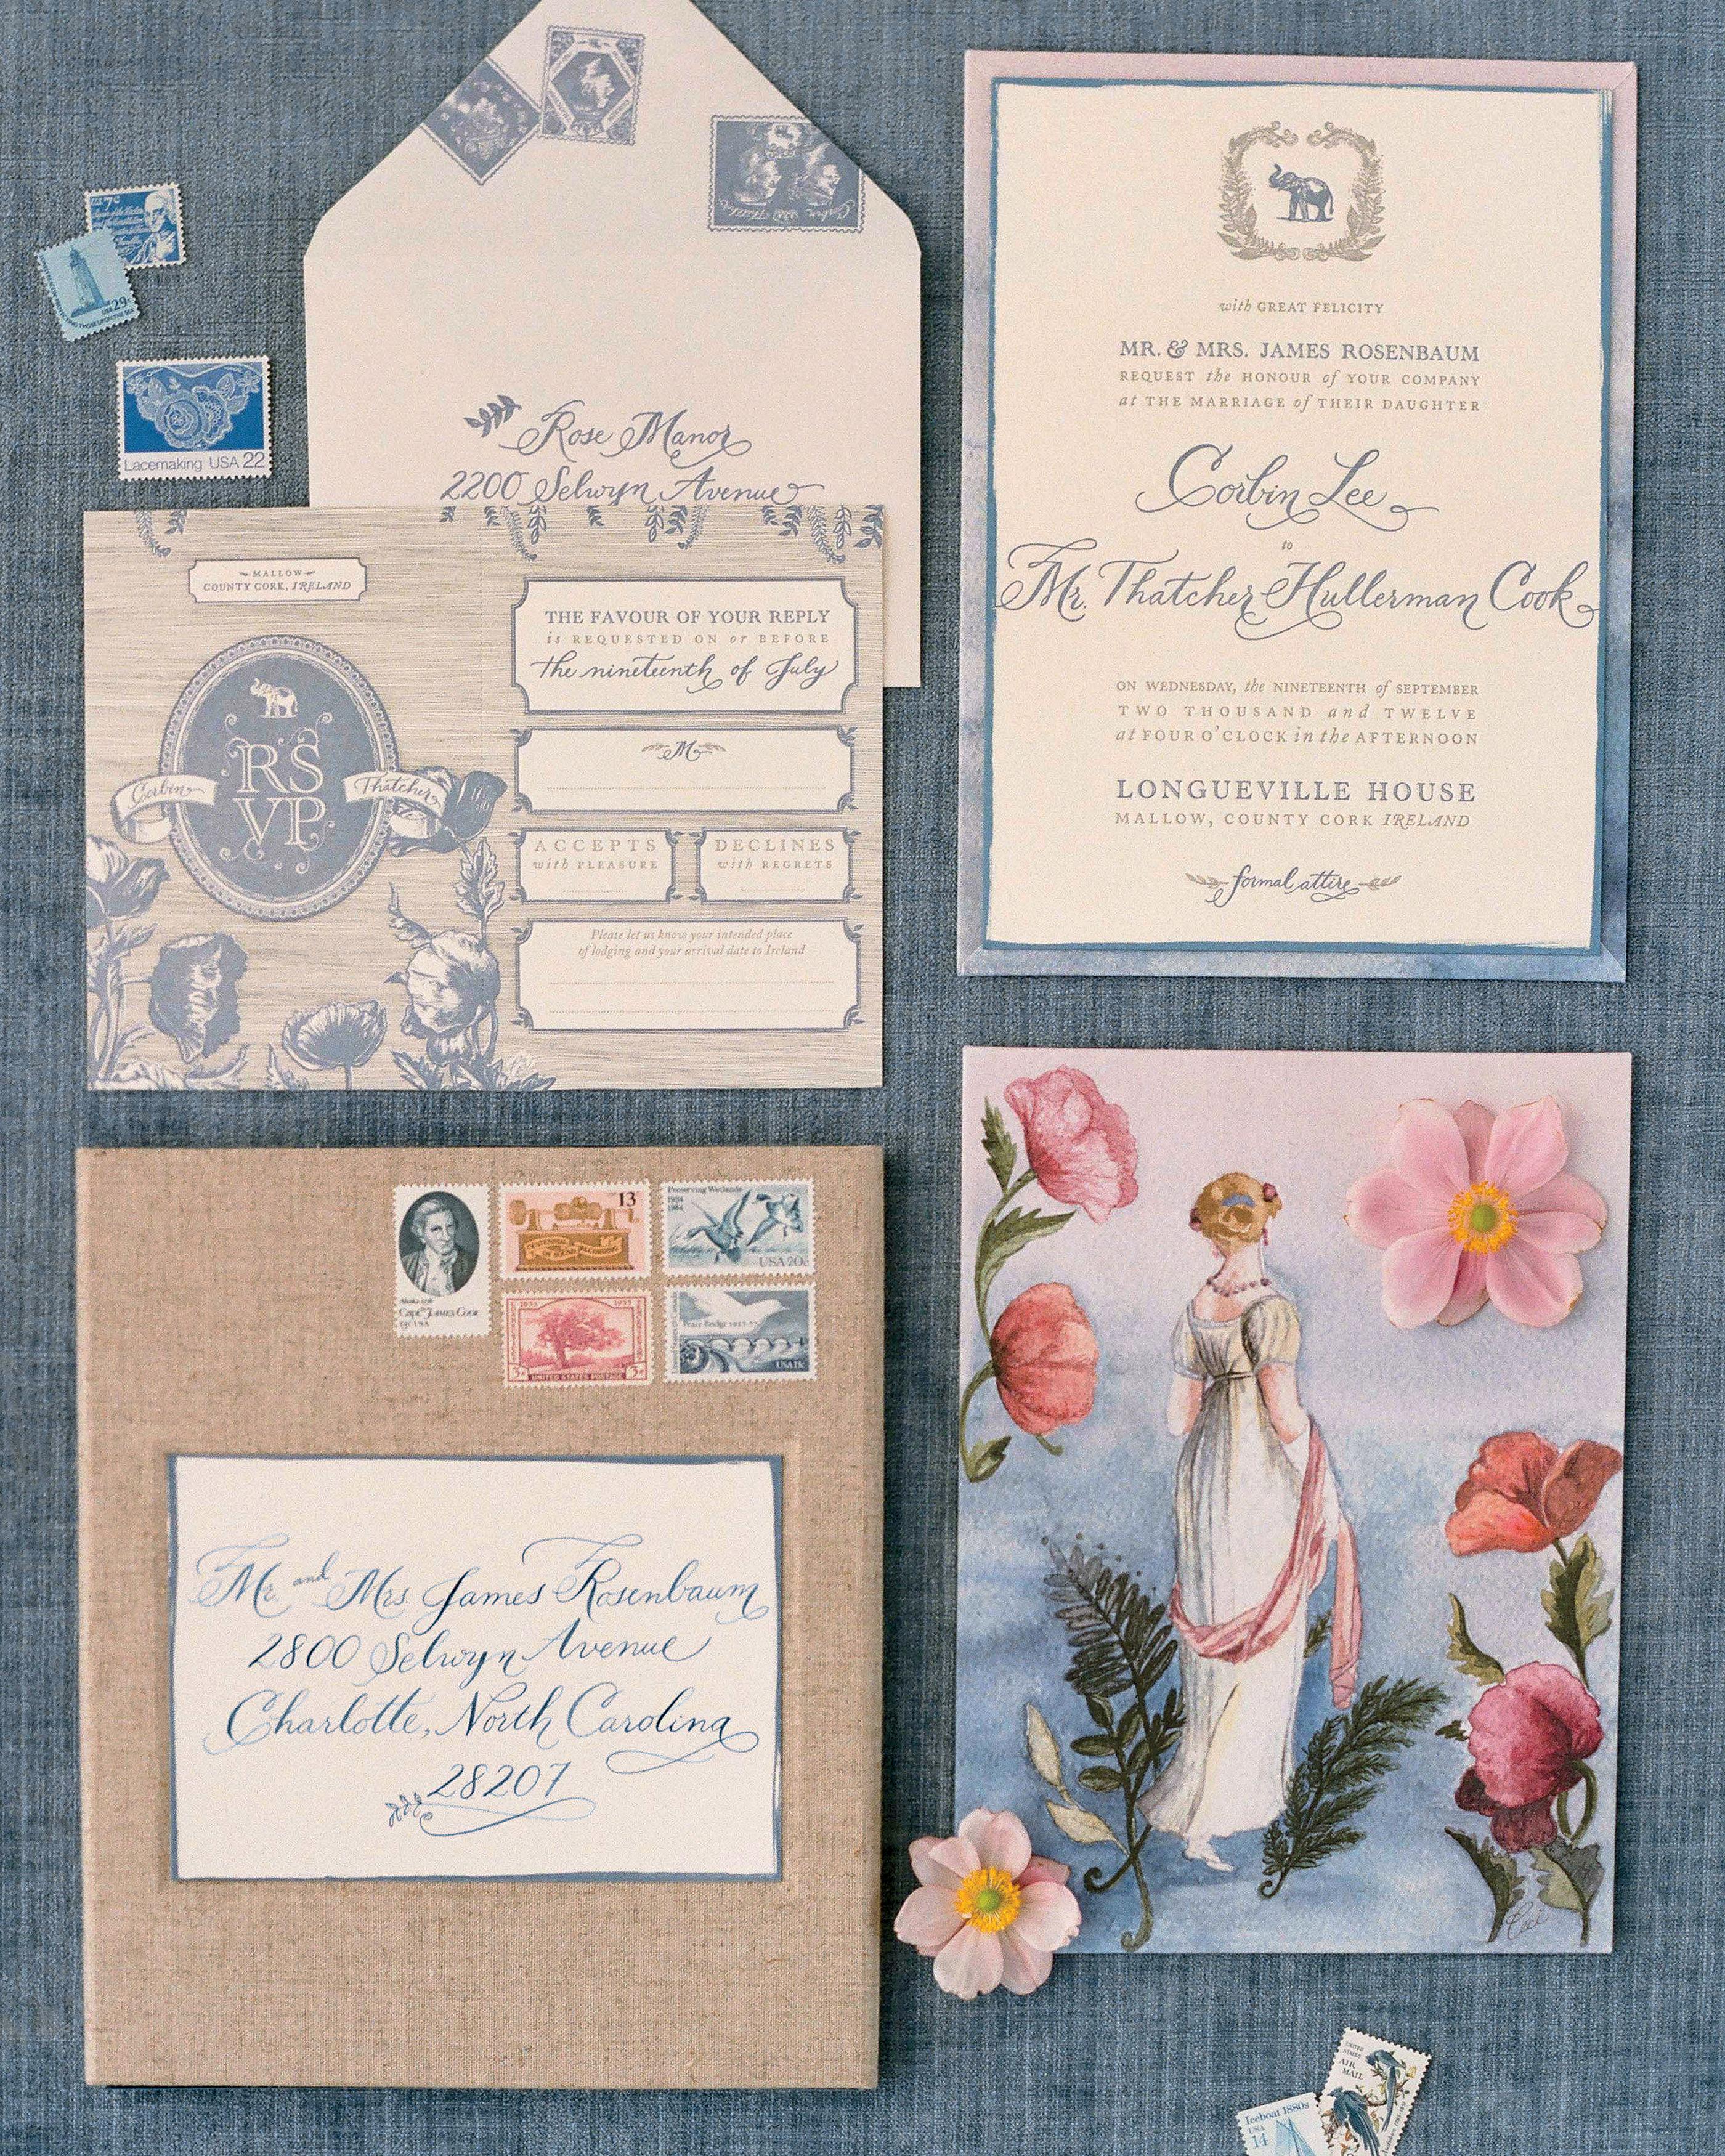 corbin-thatcher-invitations-1001-mwds109911.jpg